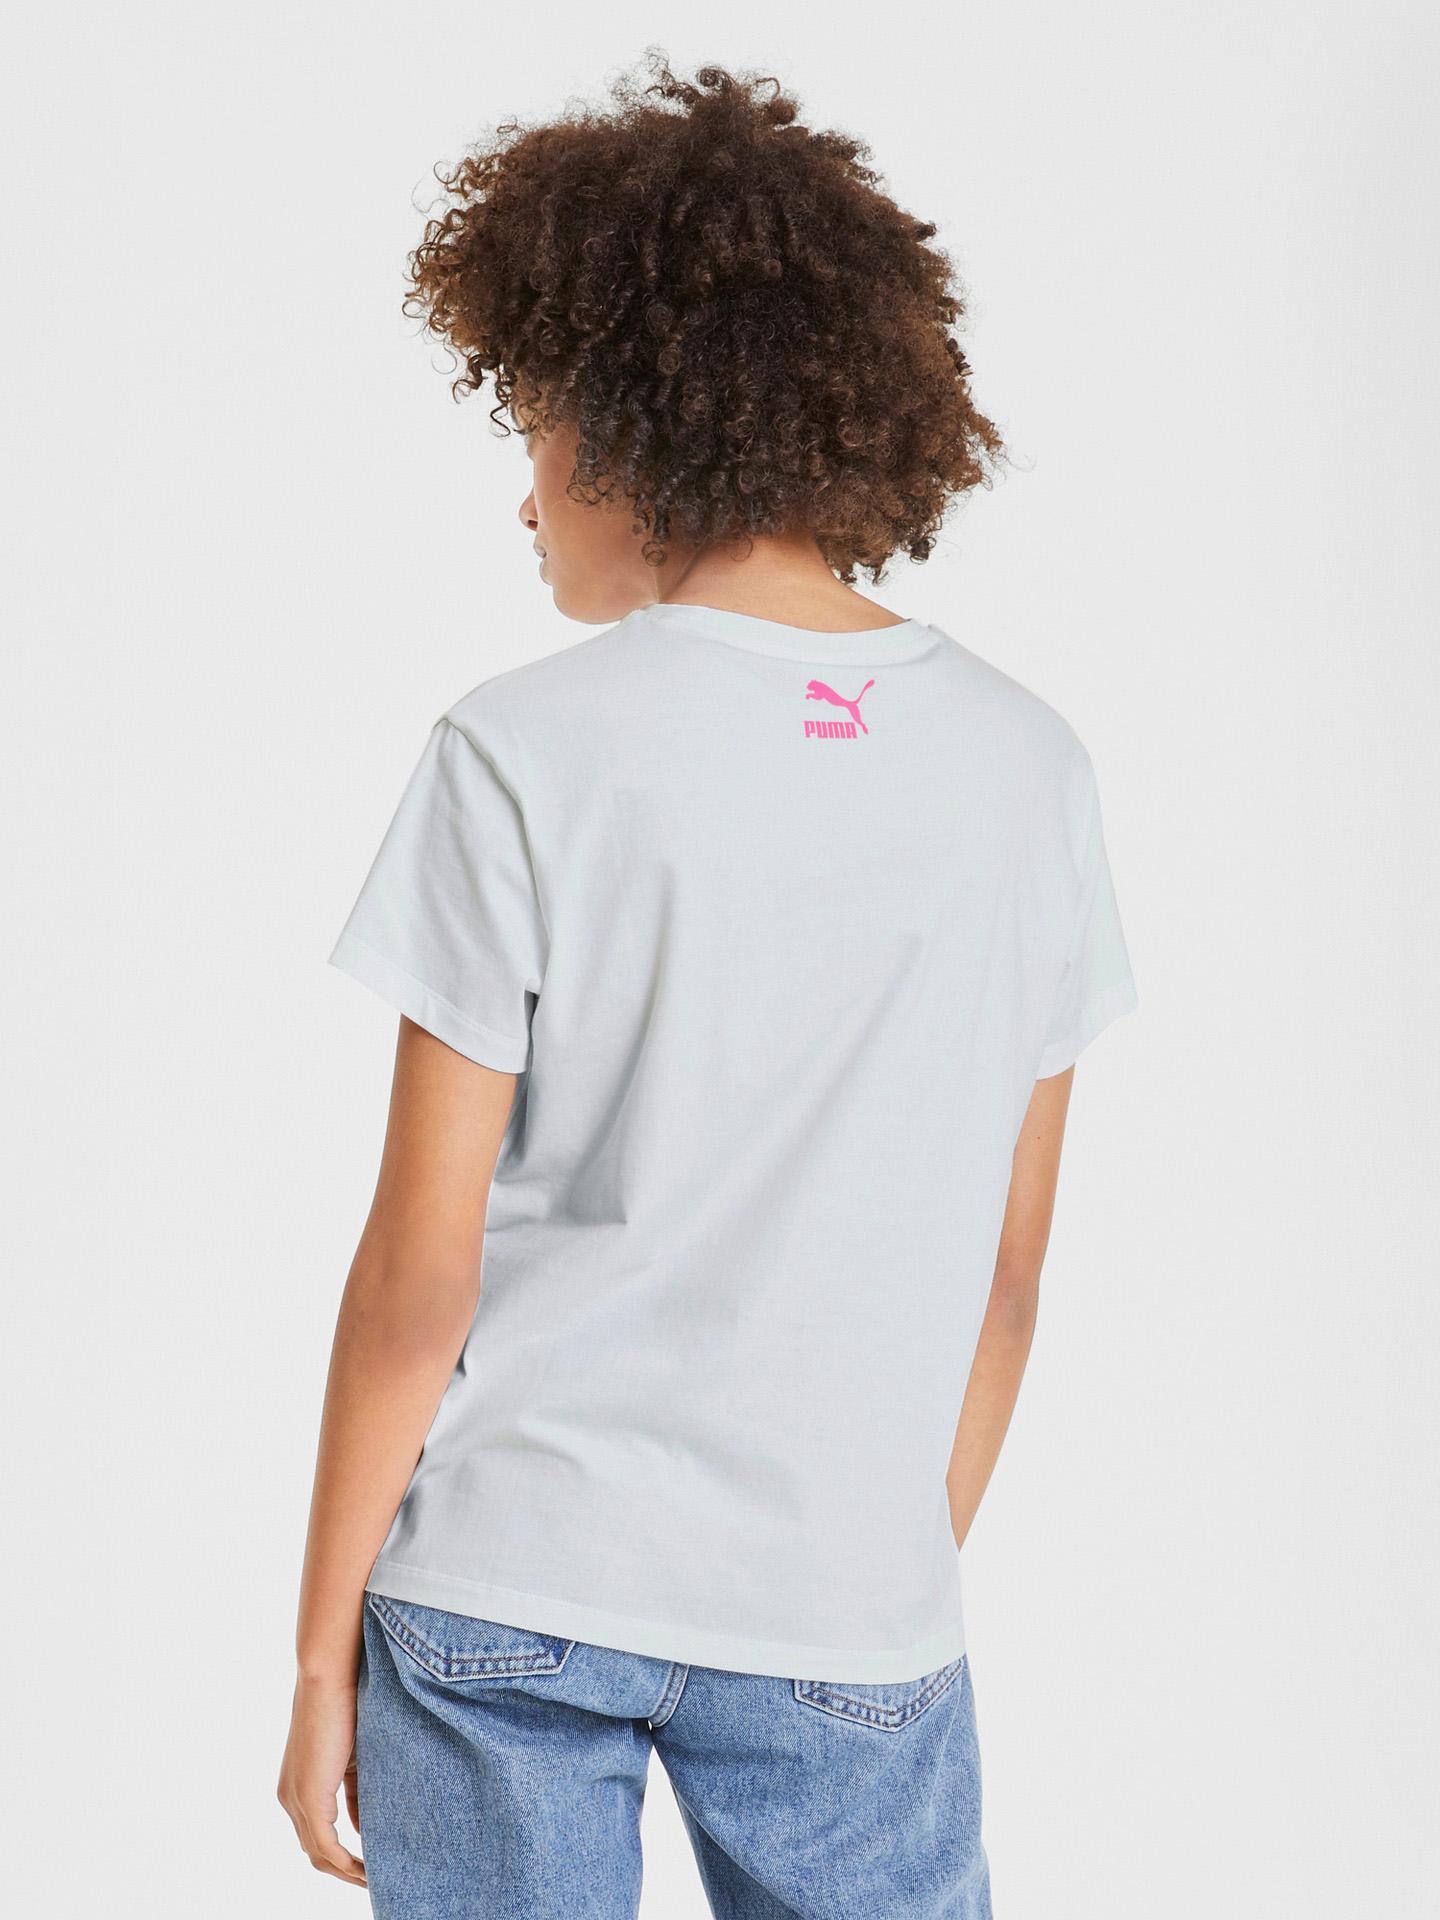 Puma white women´s T-shirt Sport